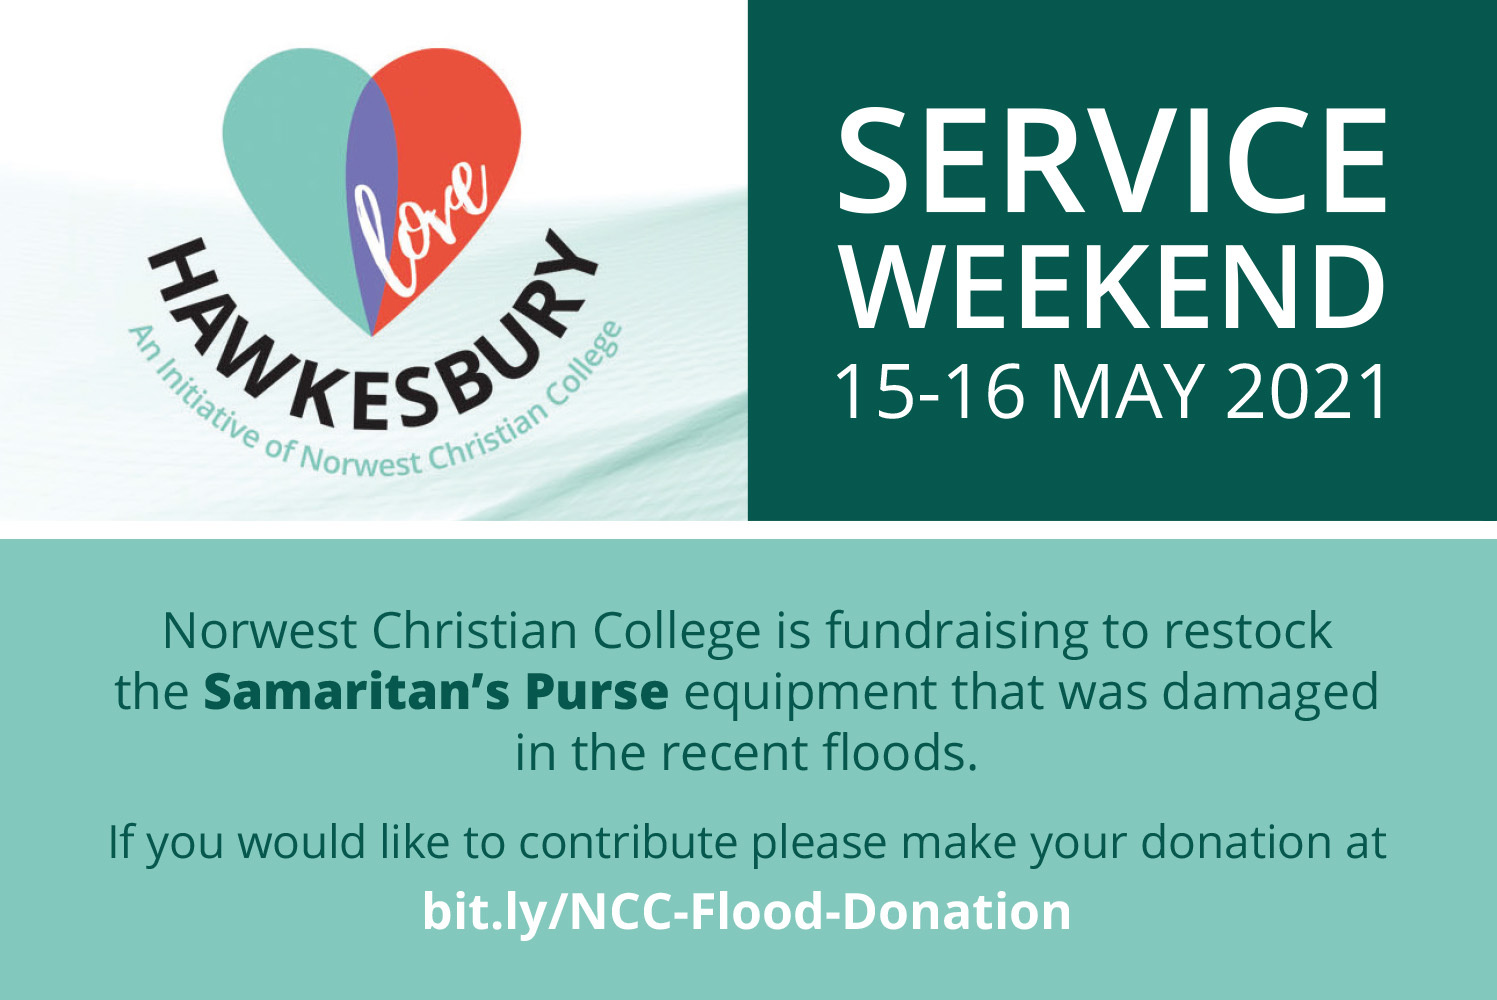 https://bit.ly/NCC-Flood-Donation